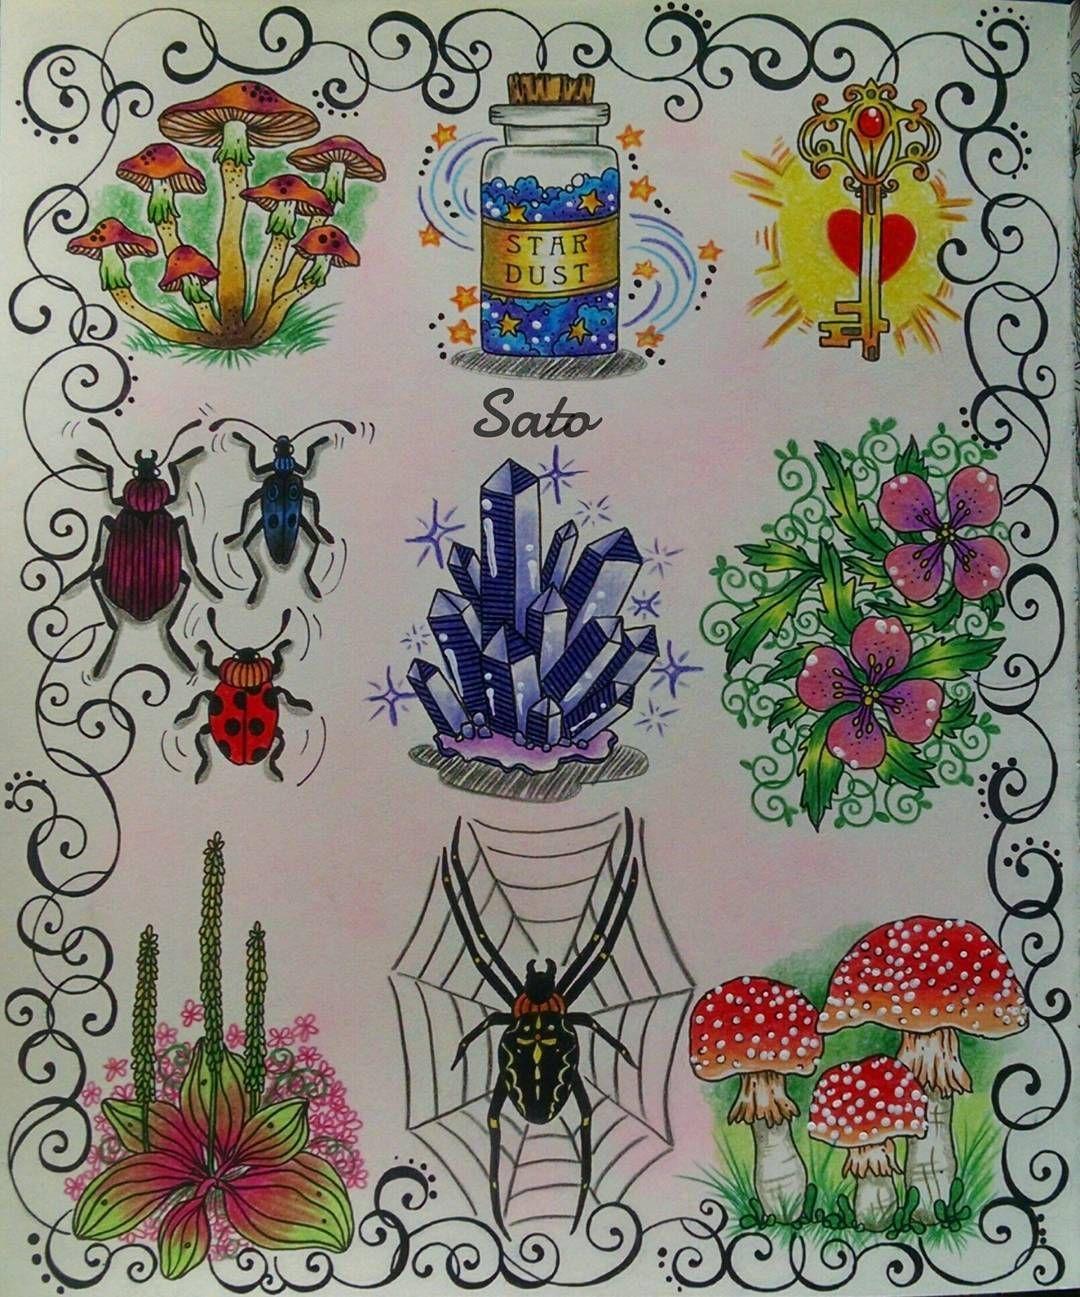 🍄🌌🔑🐞💎🌸🌺🍄 #hannakarlzon #daydreams #daydreamscoloringbook #dagdrommar #dagdrömmar #arte_e_colorir #desafioscoloridos #divasdasartes #artecomoterapia #colorindolivrostop #prazeremcolorir #mushrooms #arabesco #coloringbook #adultcoloring #beautiful #stardust #awesome #arttherapy #colortherapy #coloriage #artwork #art #instaart #instagood